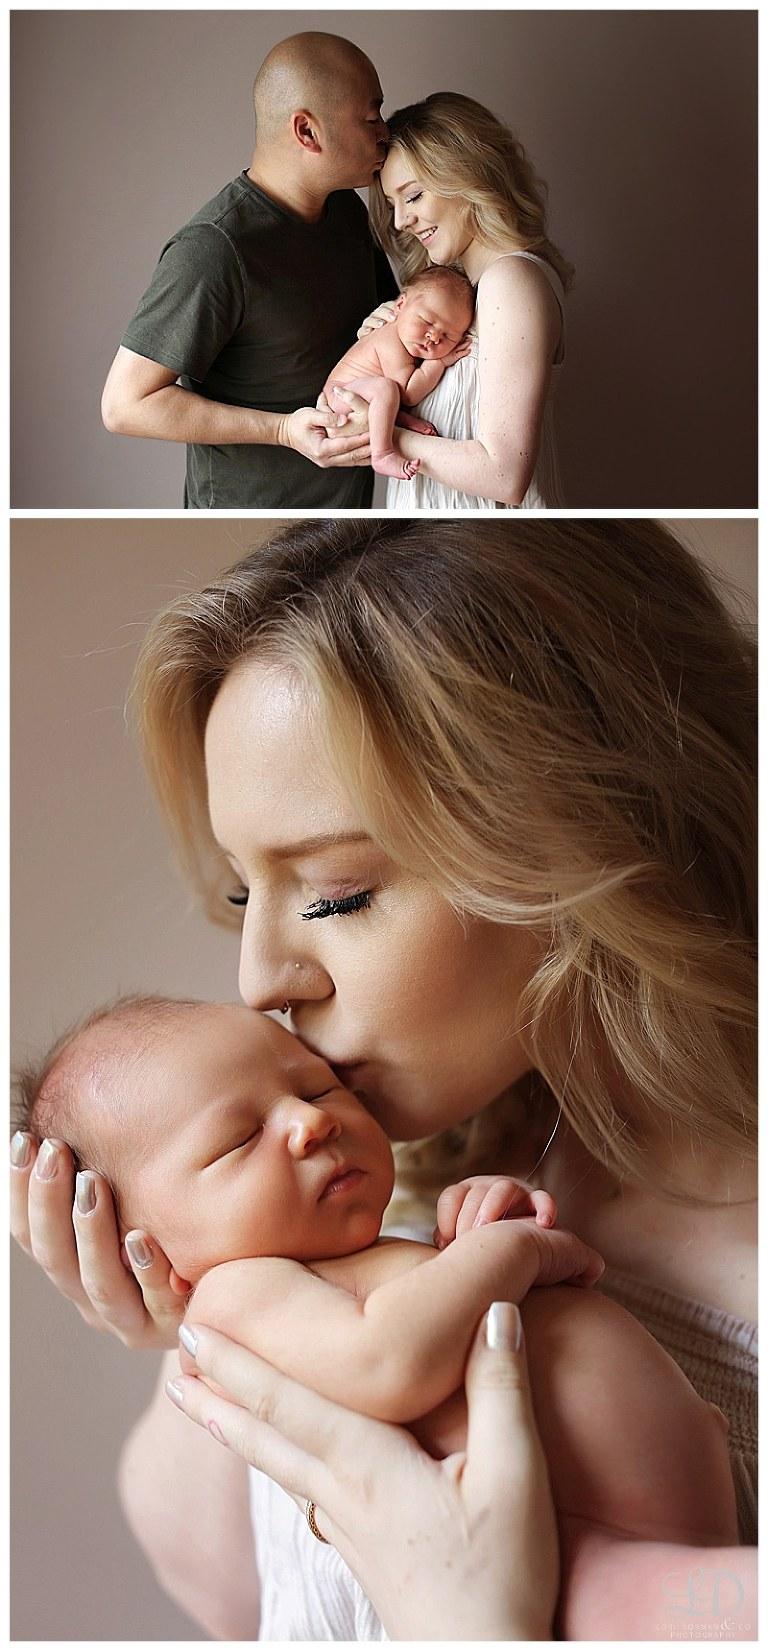 sweet maternity photoshoot-lori dorman photography-maternity boudoir-professional photographer_4848.jpg